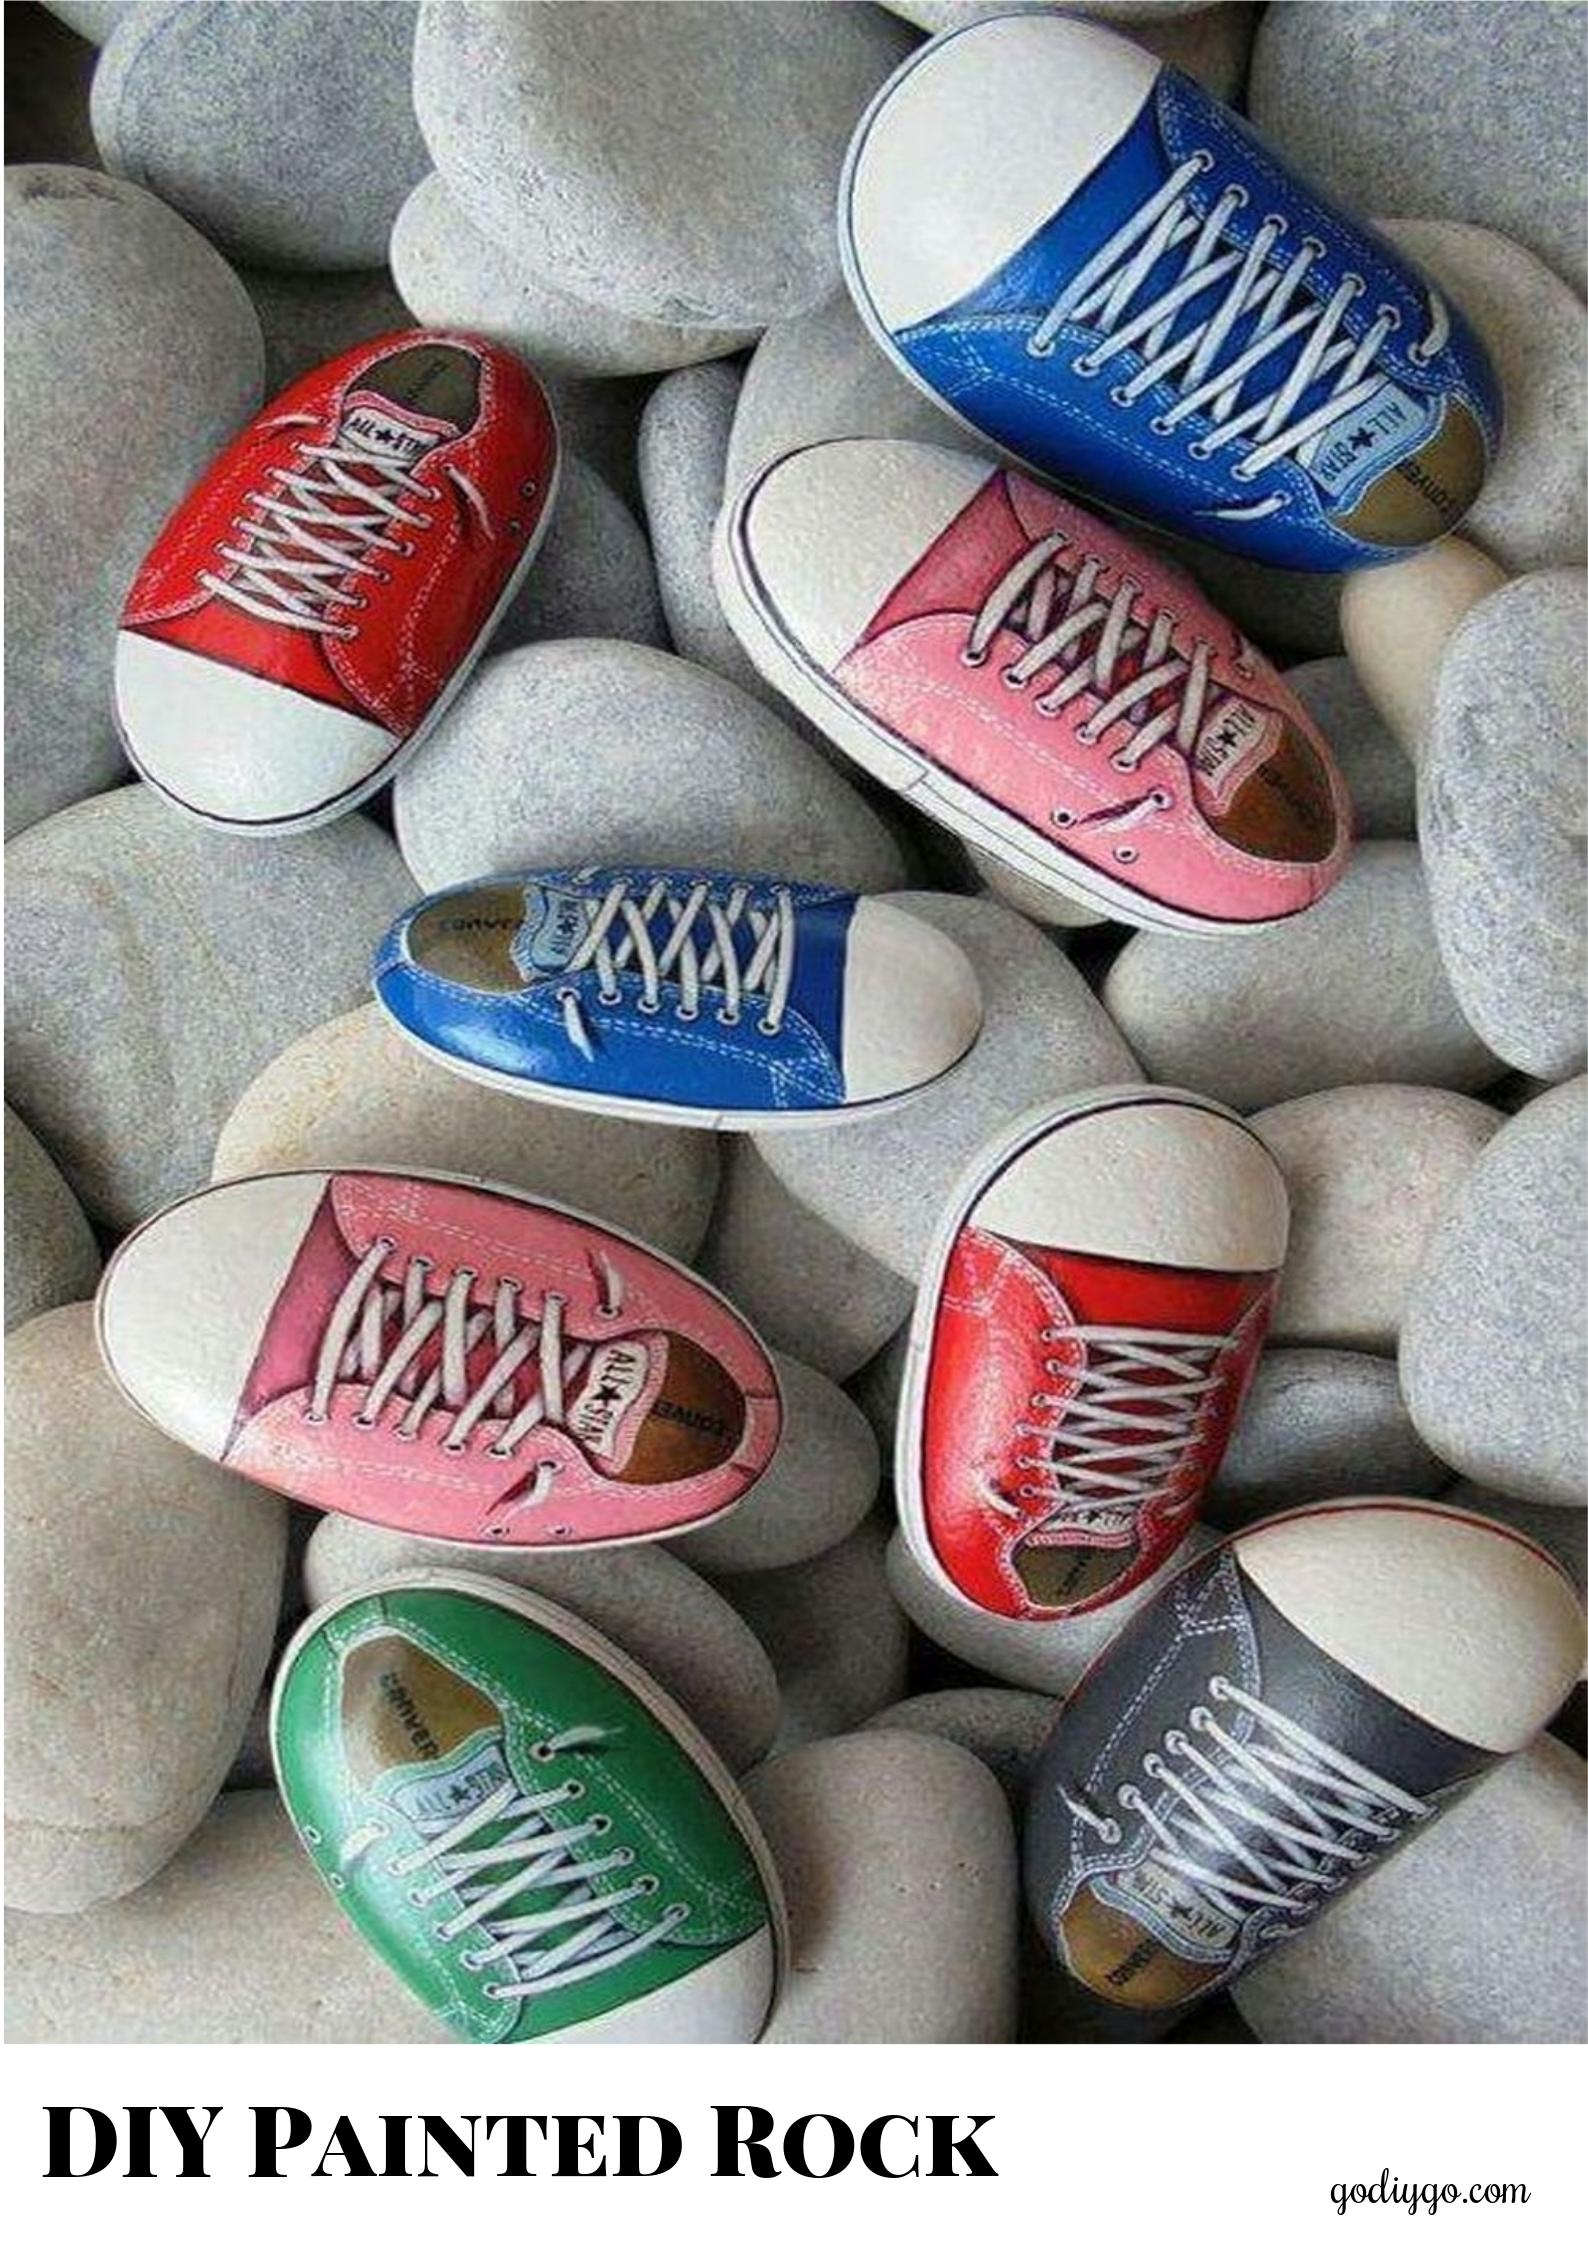 20 Incredible DIY Painted Rock Design Ideas - GODIYGO.COM on Rock Decorating Ideas  id=83781